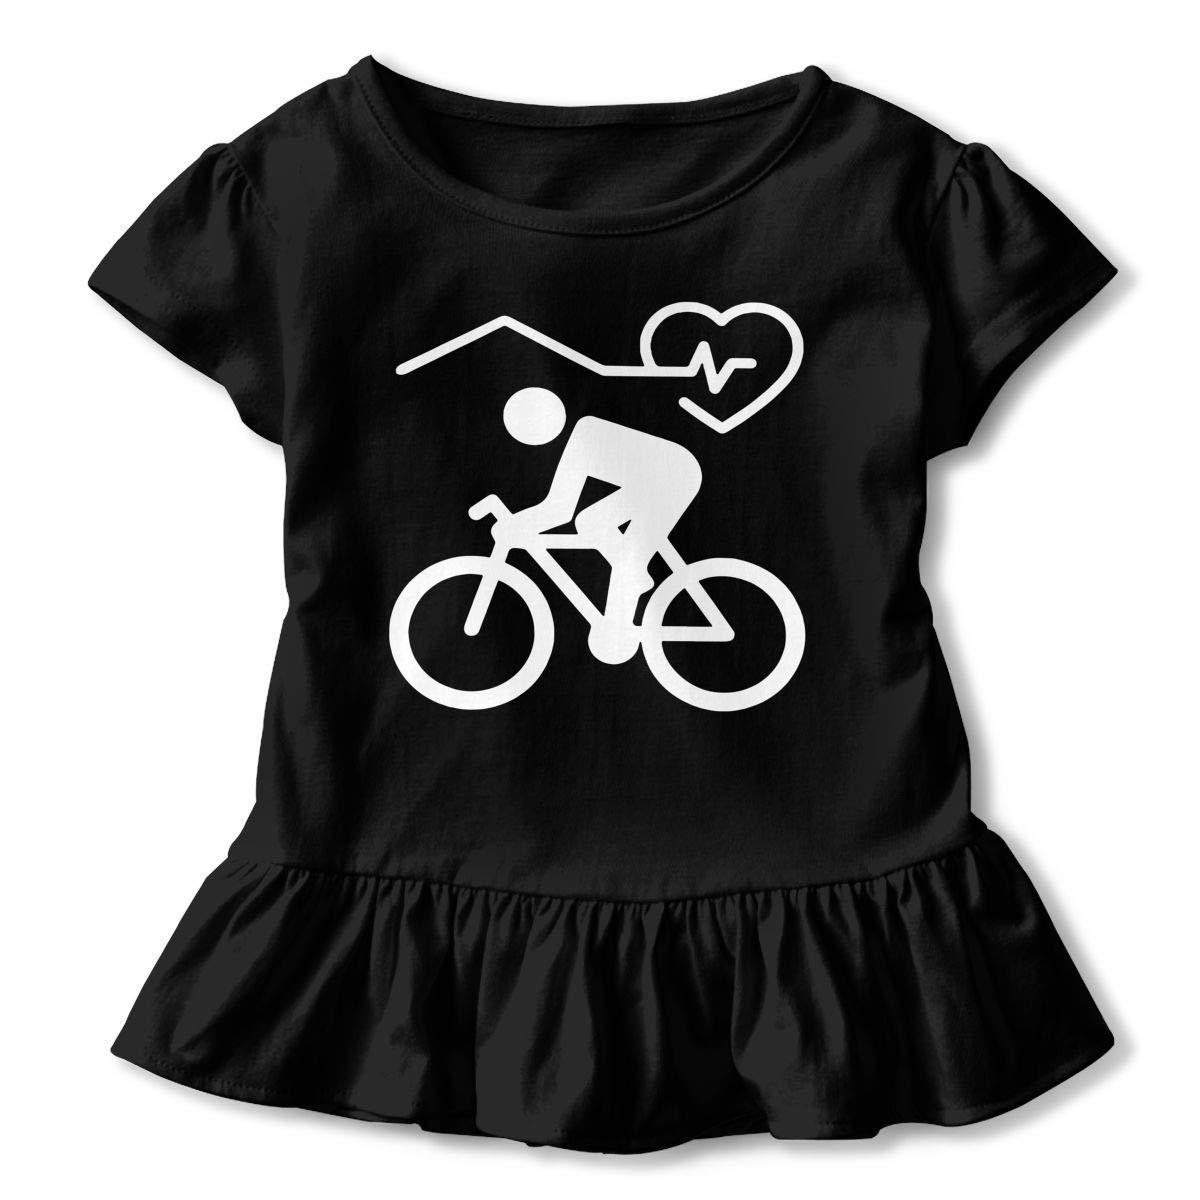 SHIRT1-KIDS Cycling Toddler//Infant Girls Short Sleeve Ruffles Shirt Tee for 2-6 Toddlers